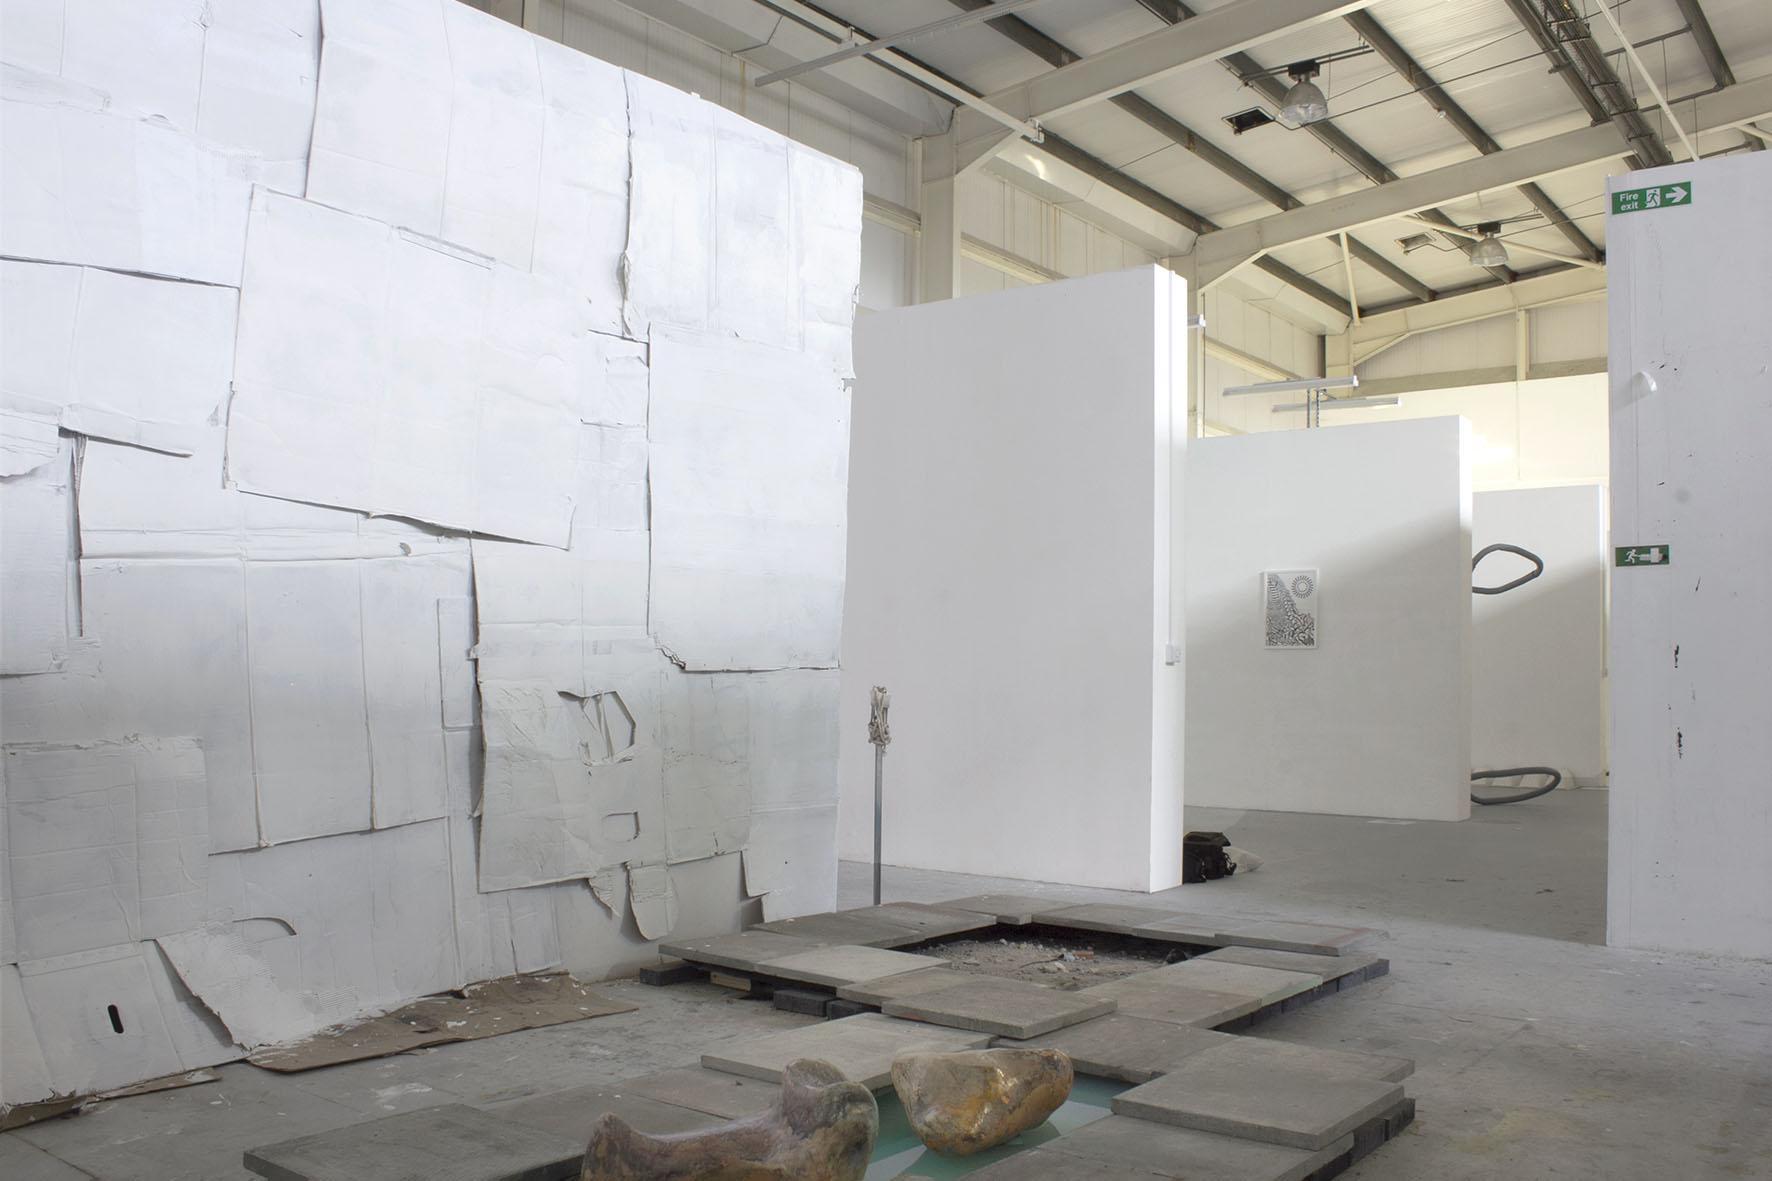 2019 Installation views at Asquith Gibbs Building Deptford  interim show MFA Fine Arts, University of Goldsmiths London UK